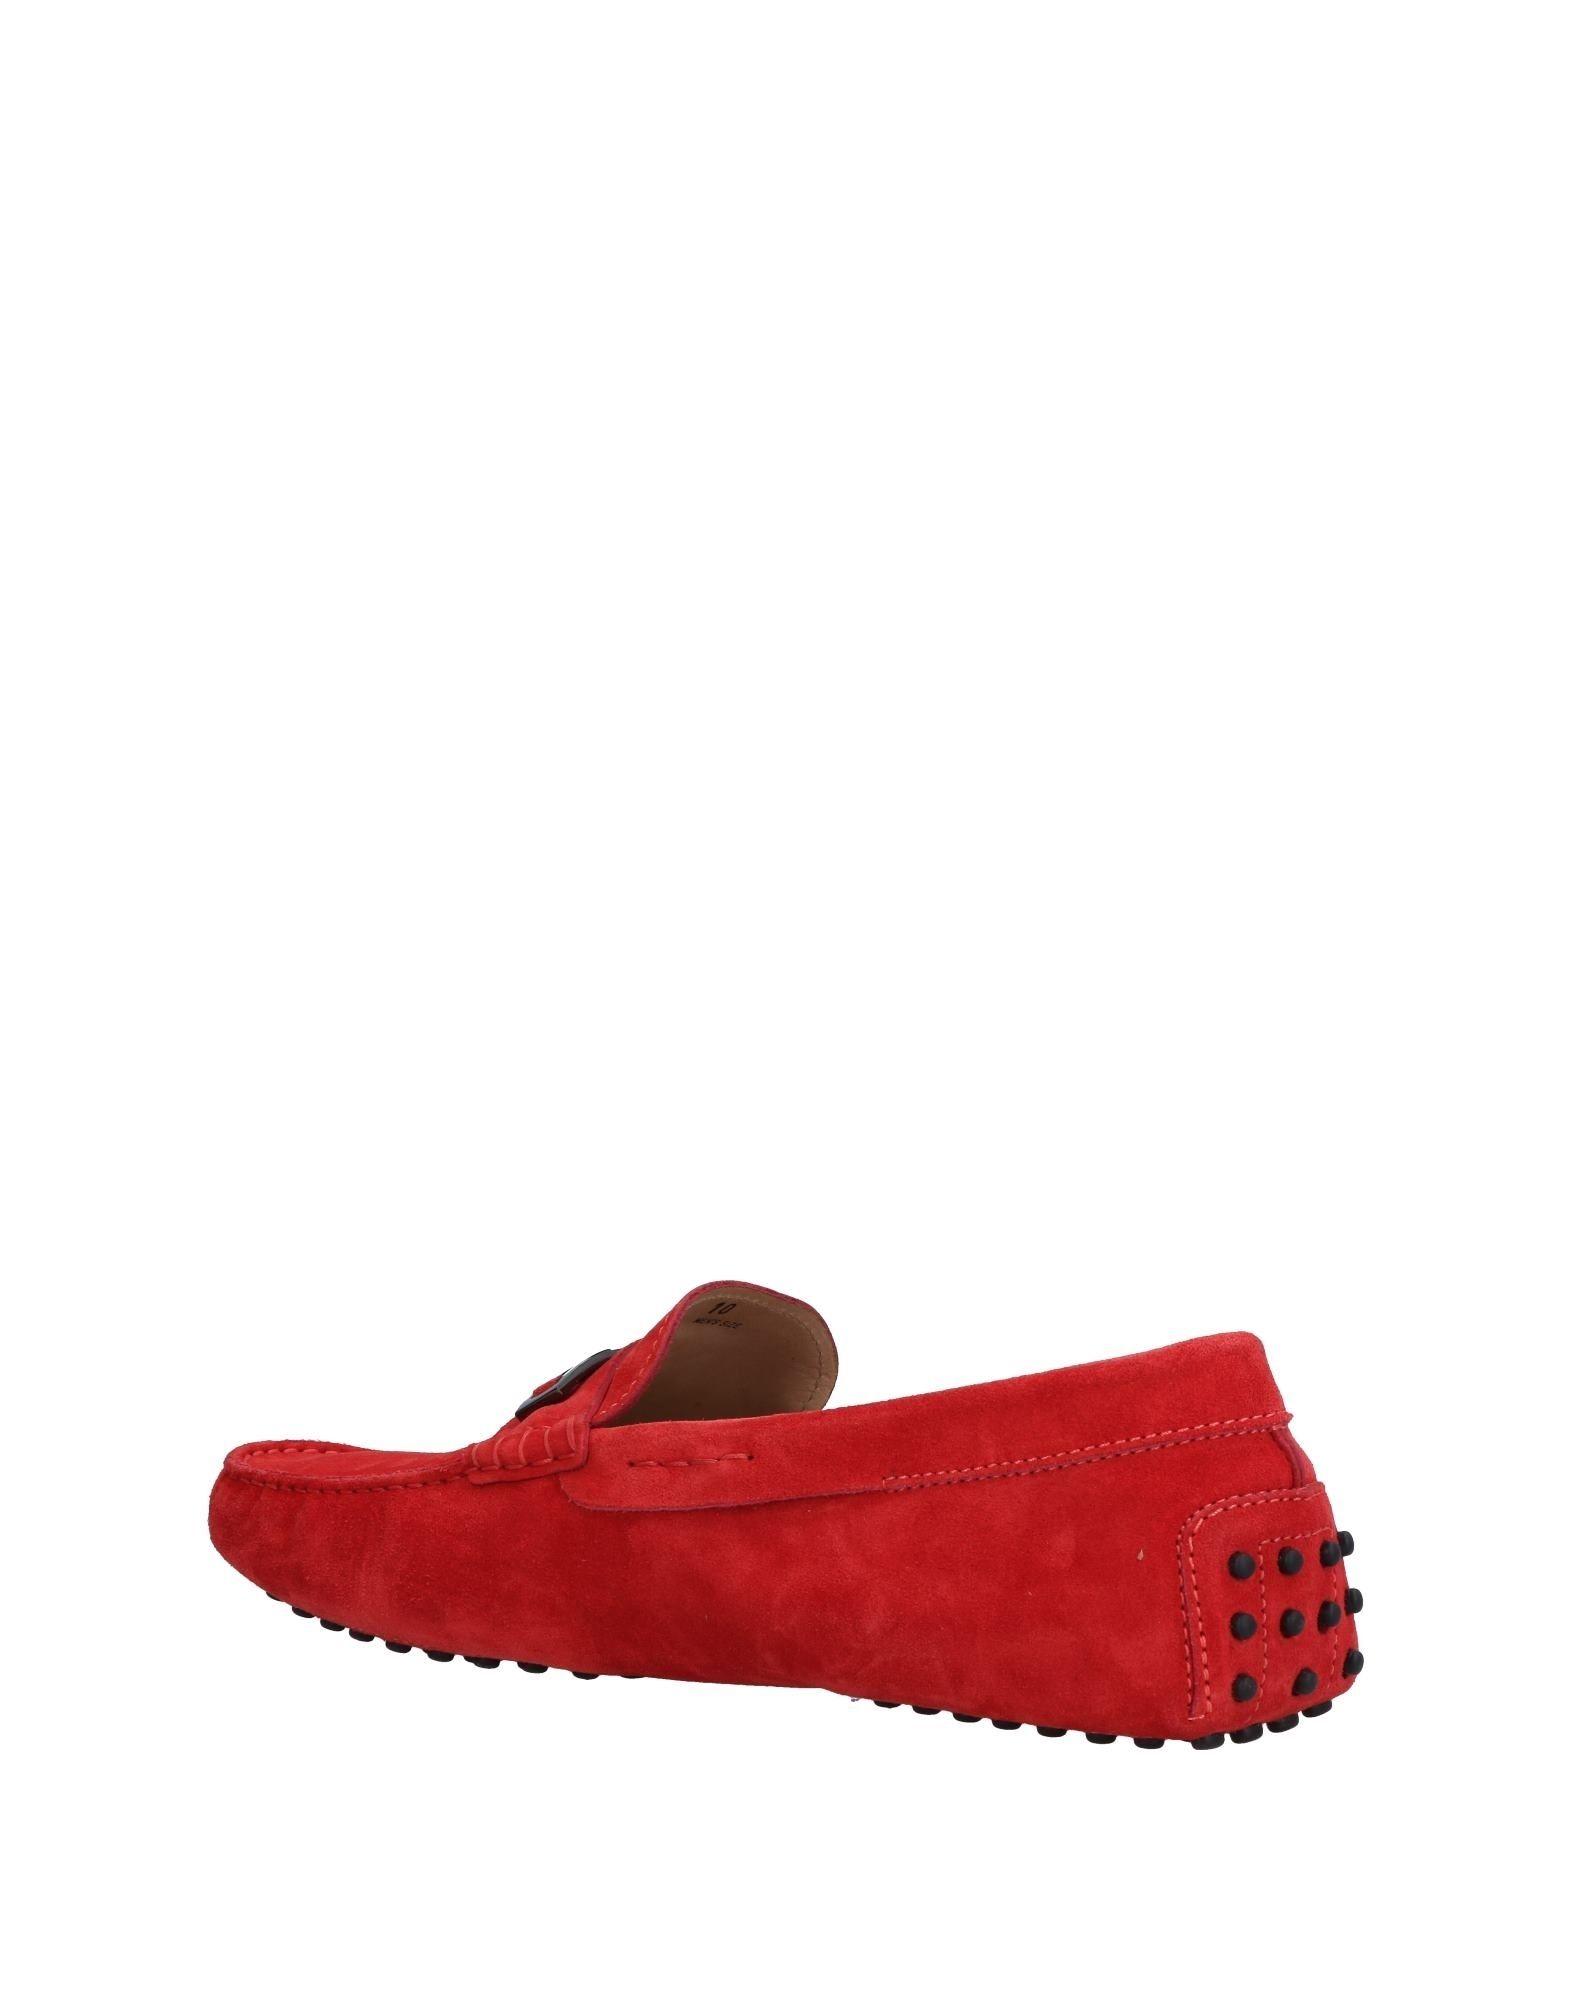 Tod's Mokassins Herren  11505068FS Gute Qualität beliebte Schuhe